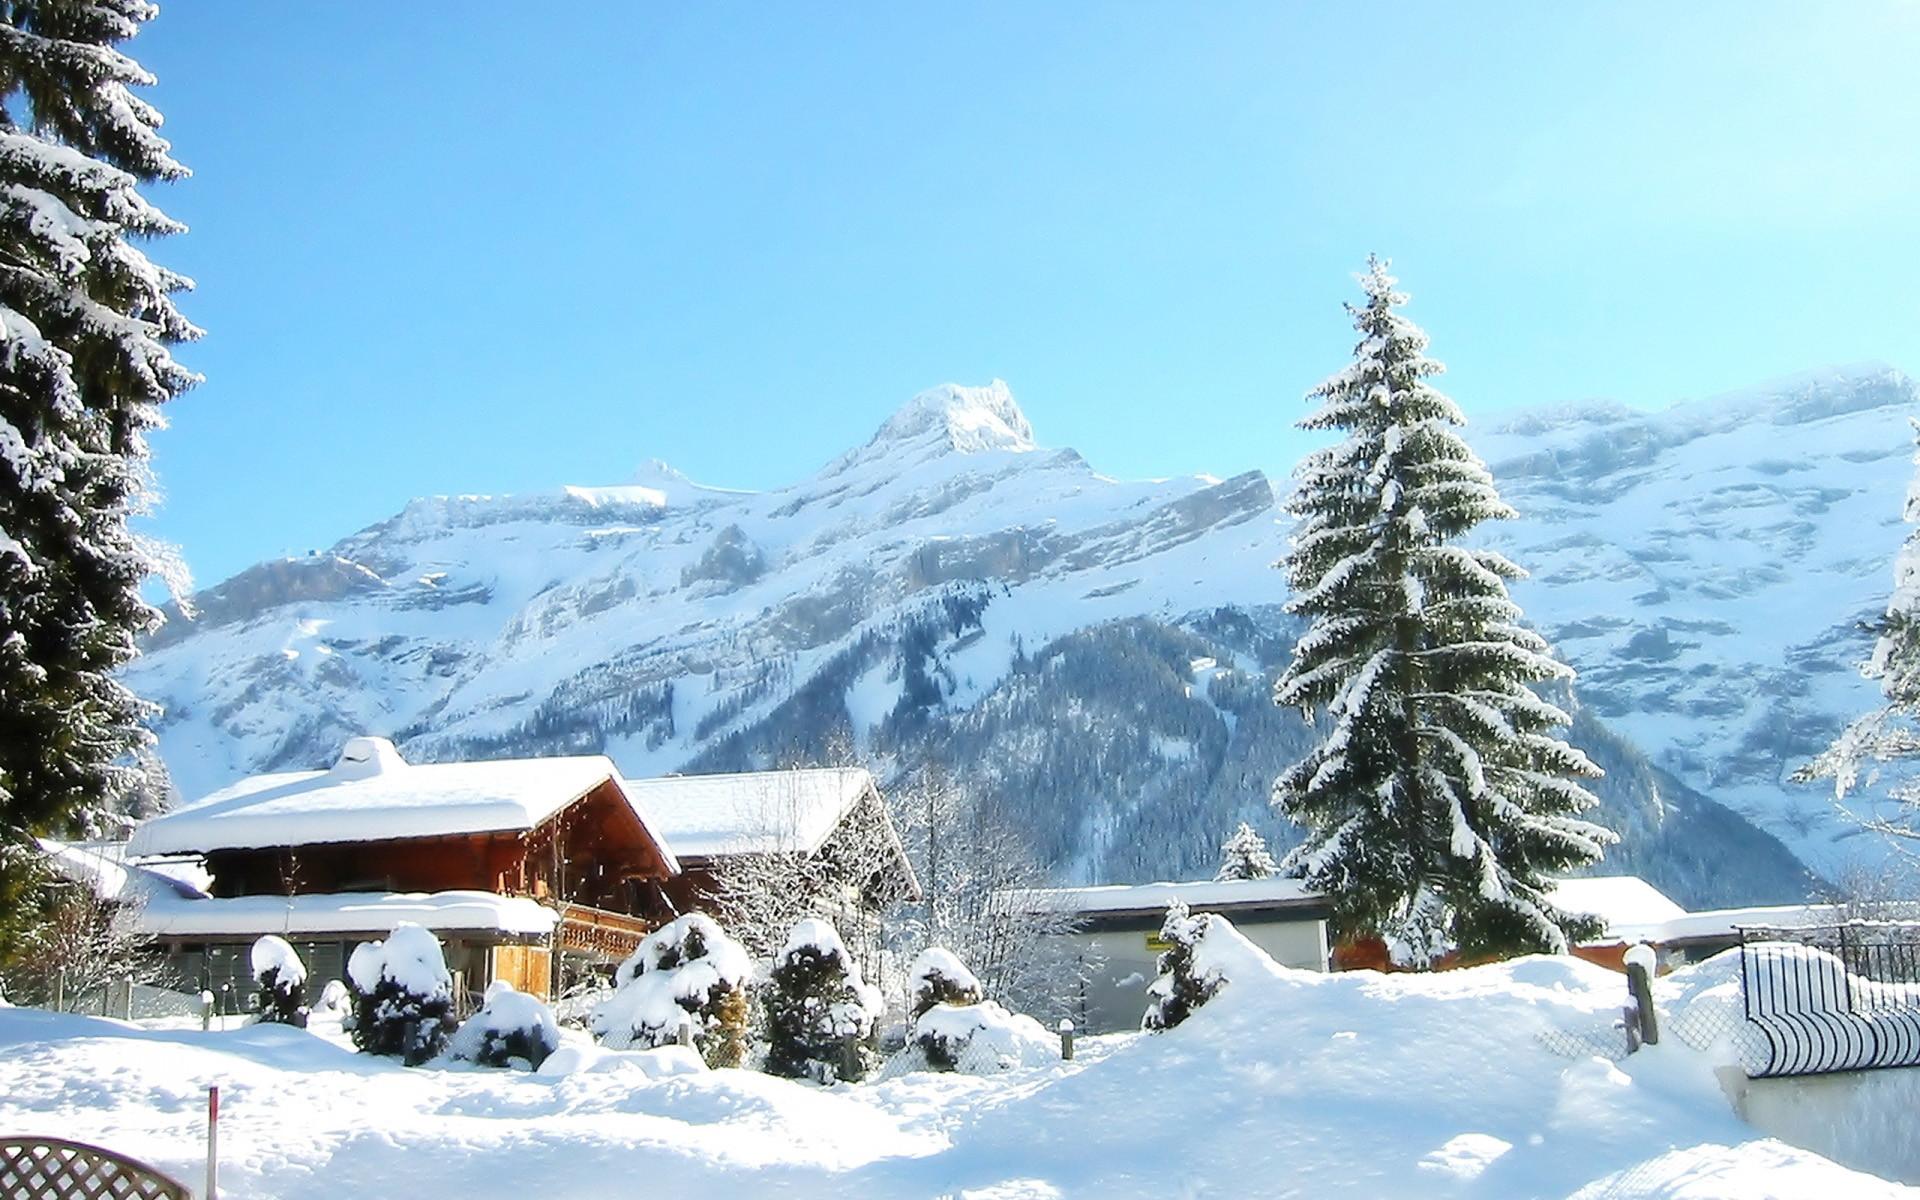 Previous: Snowy Yard …